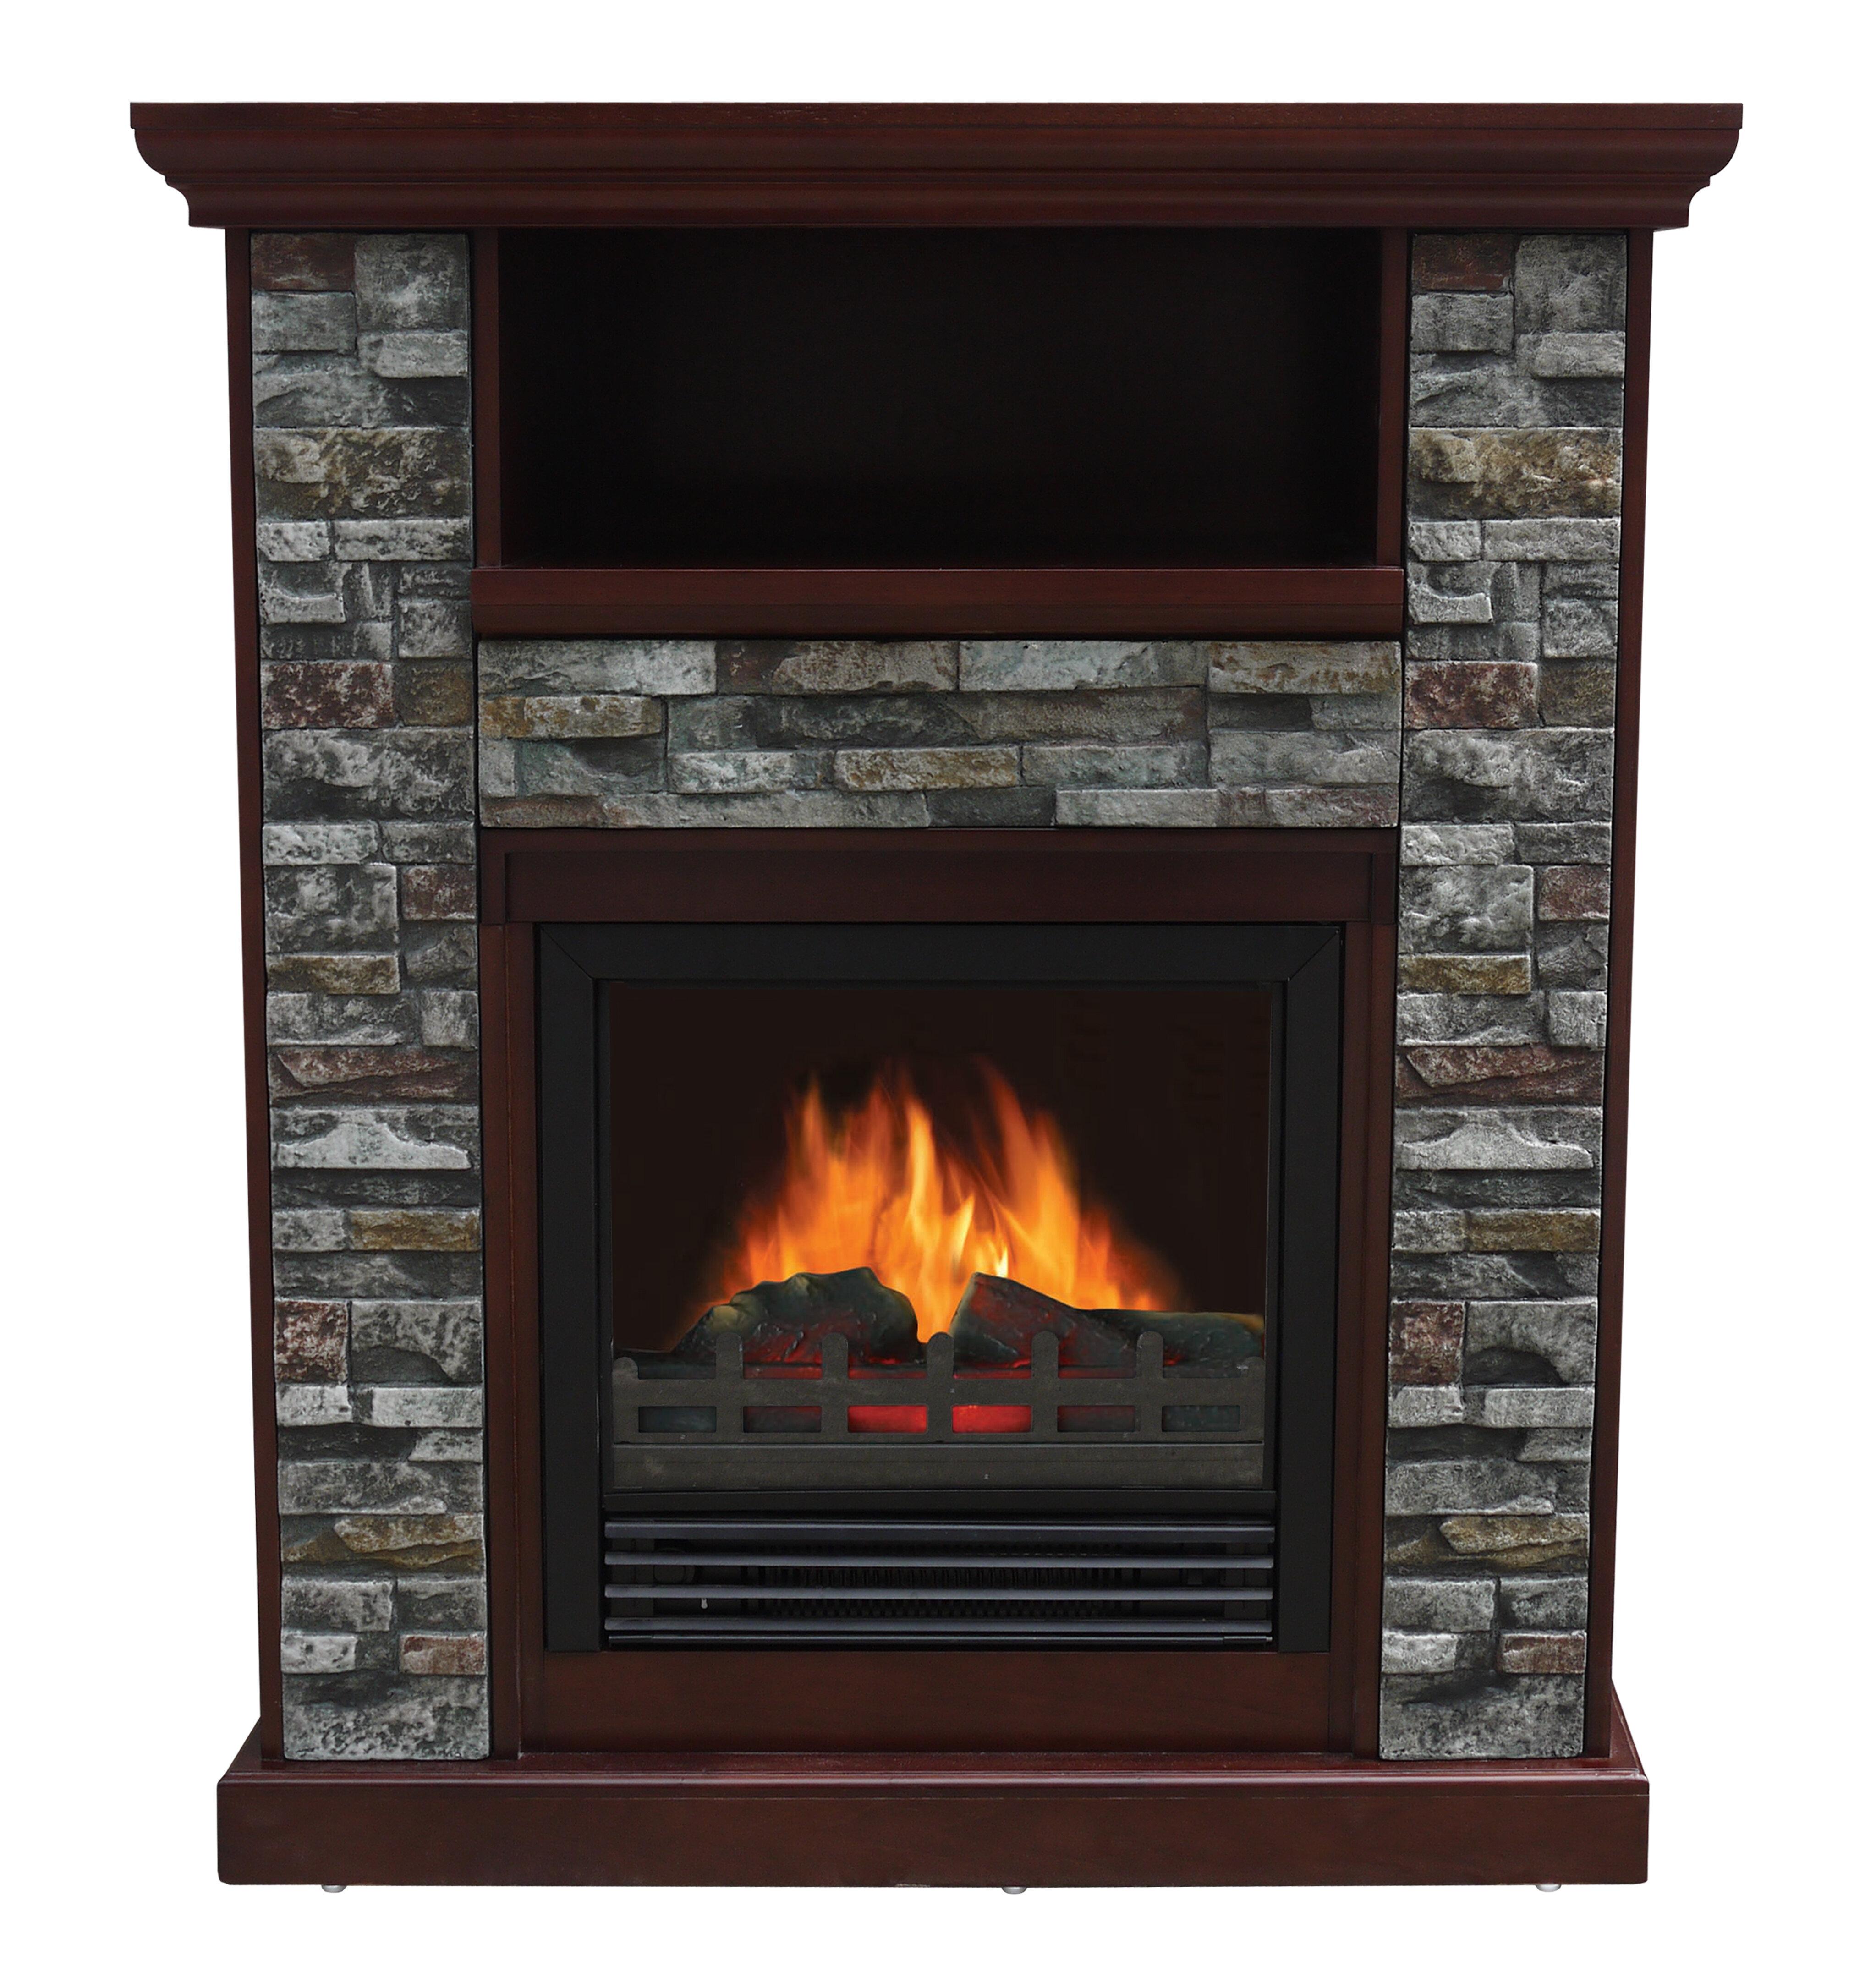 b q stove grand at bq prd electric opti departments fireplace realistic most dimplex diy myst